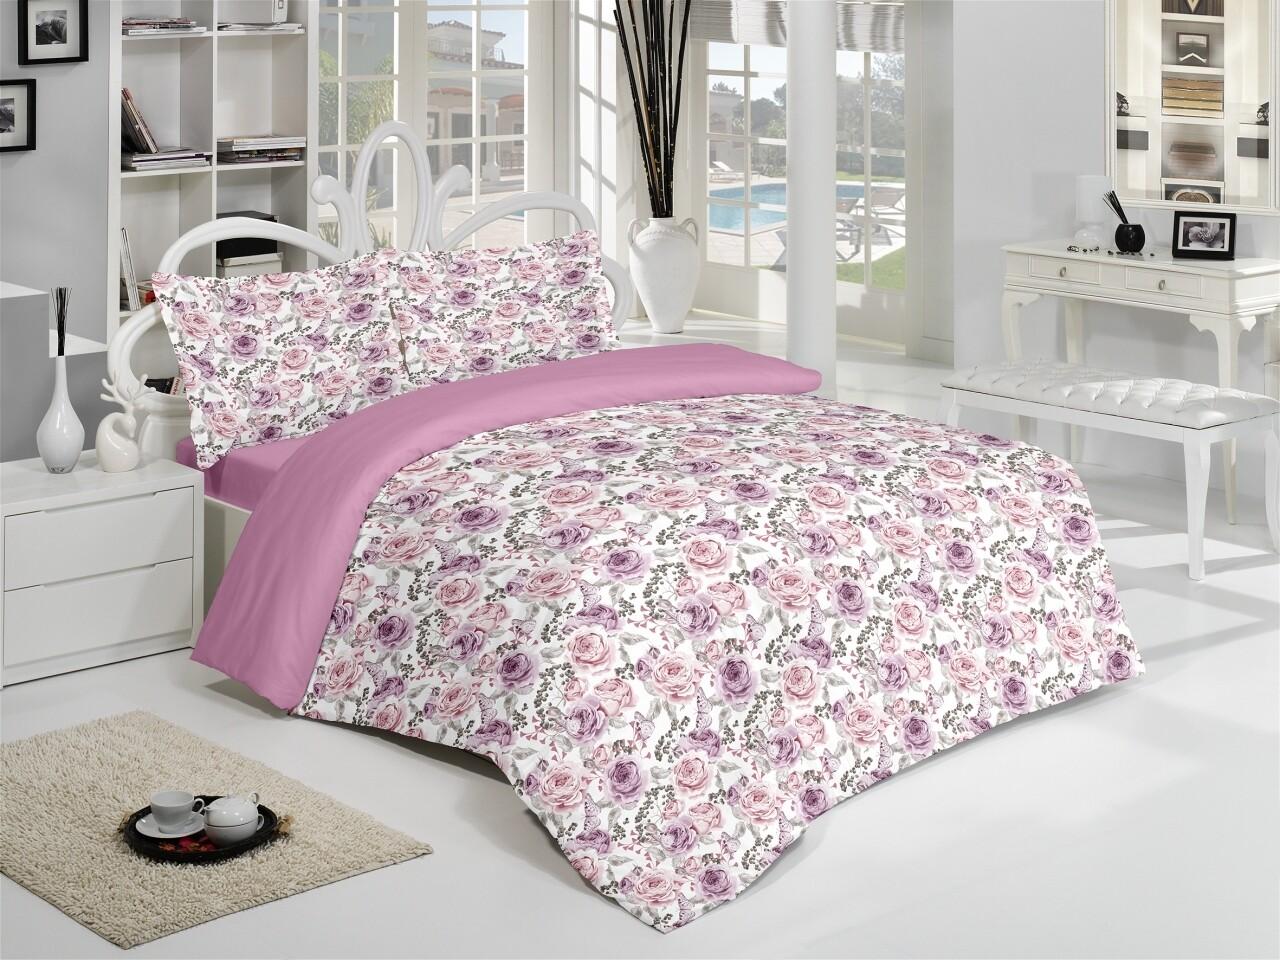 Lenjerie de pat pentru doua persoane Joie Bedora, Cotton Rich